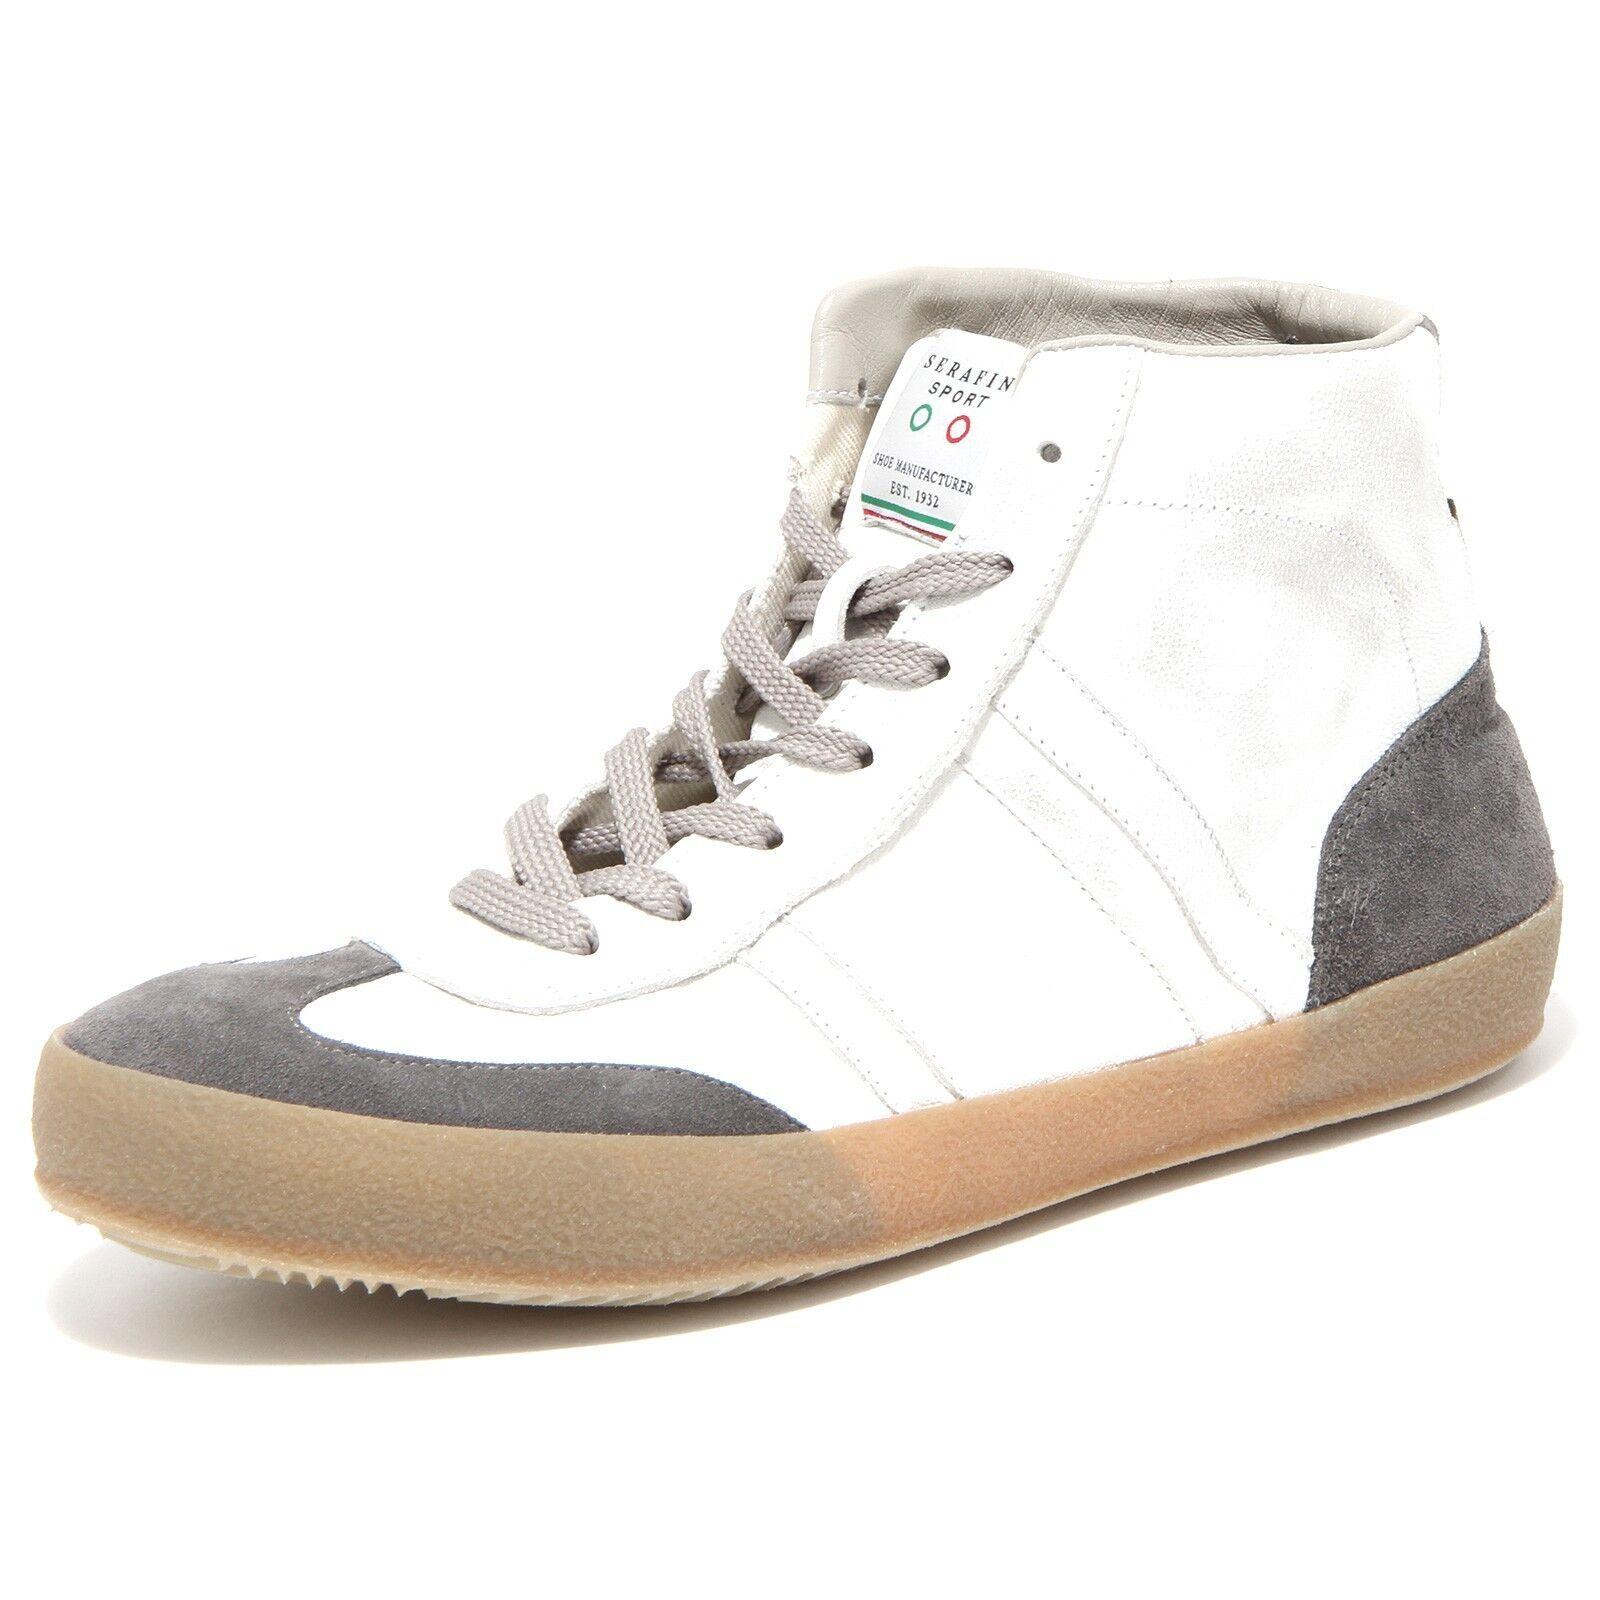 69434 sneaker sneaker 69434 SERAFINI LUXURY BASKET VINTAGE scarpa uomo shoes Uomo